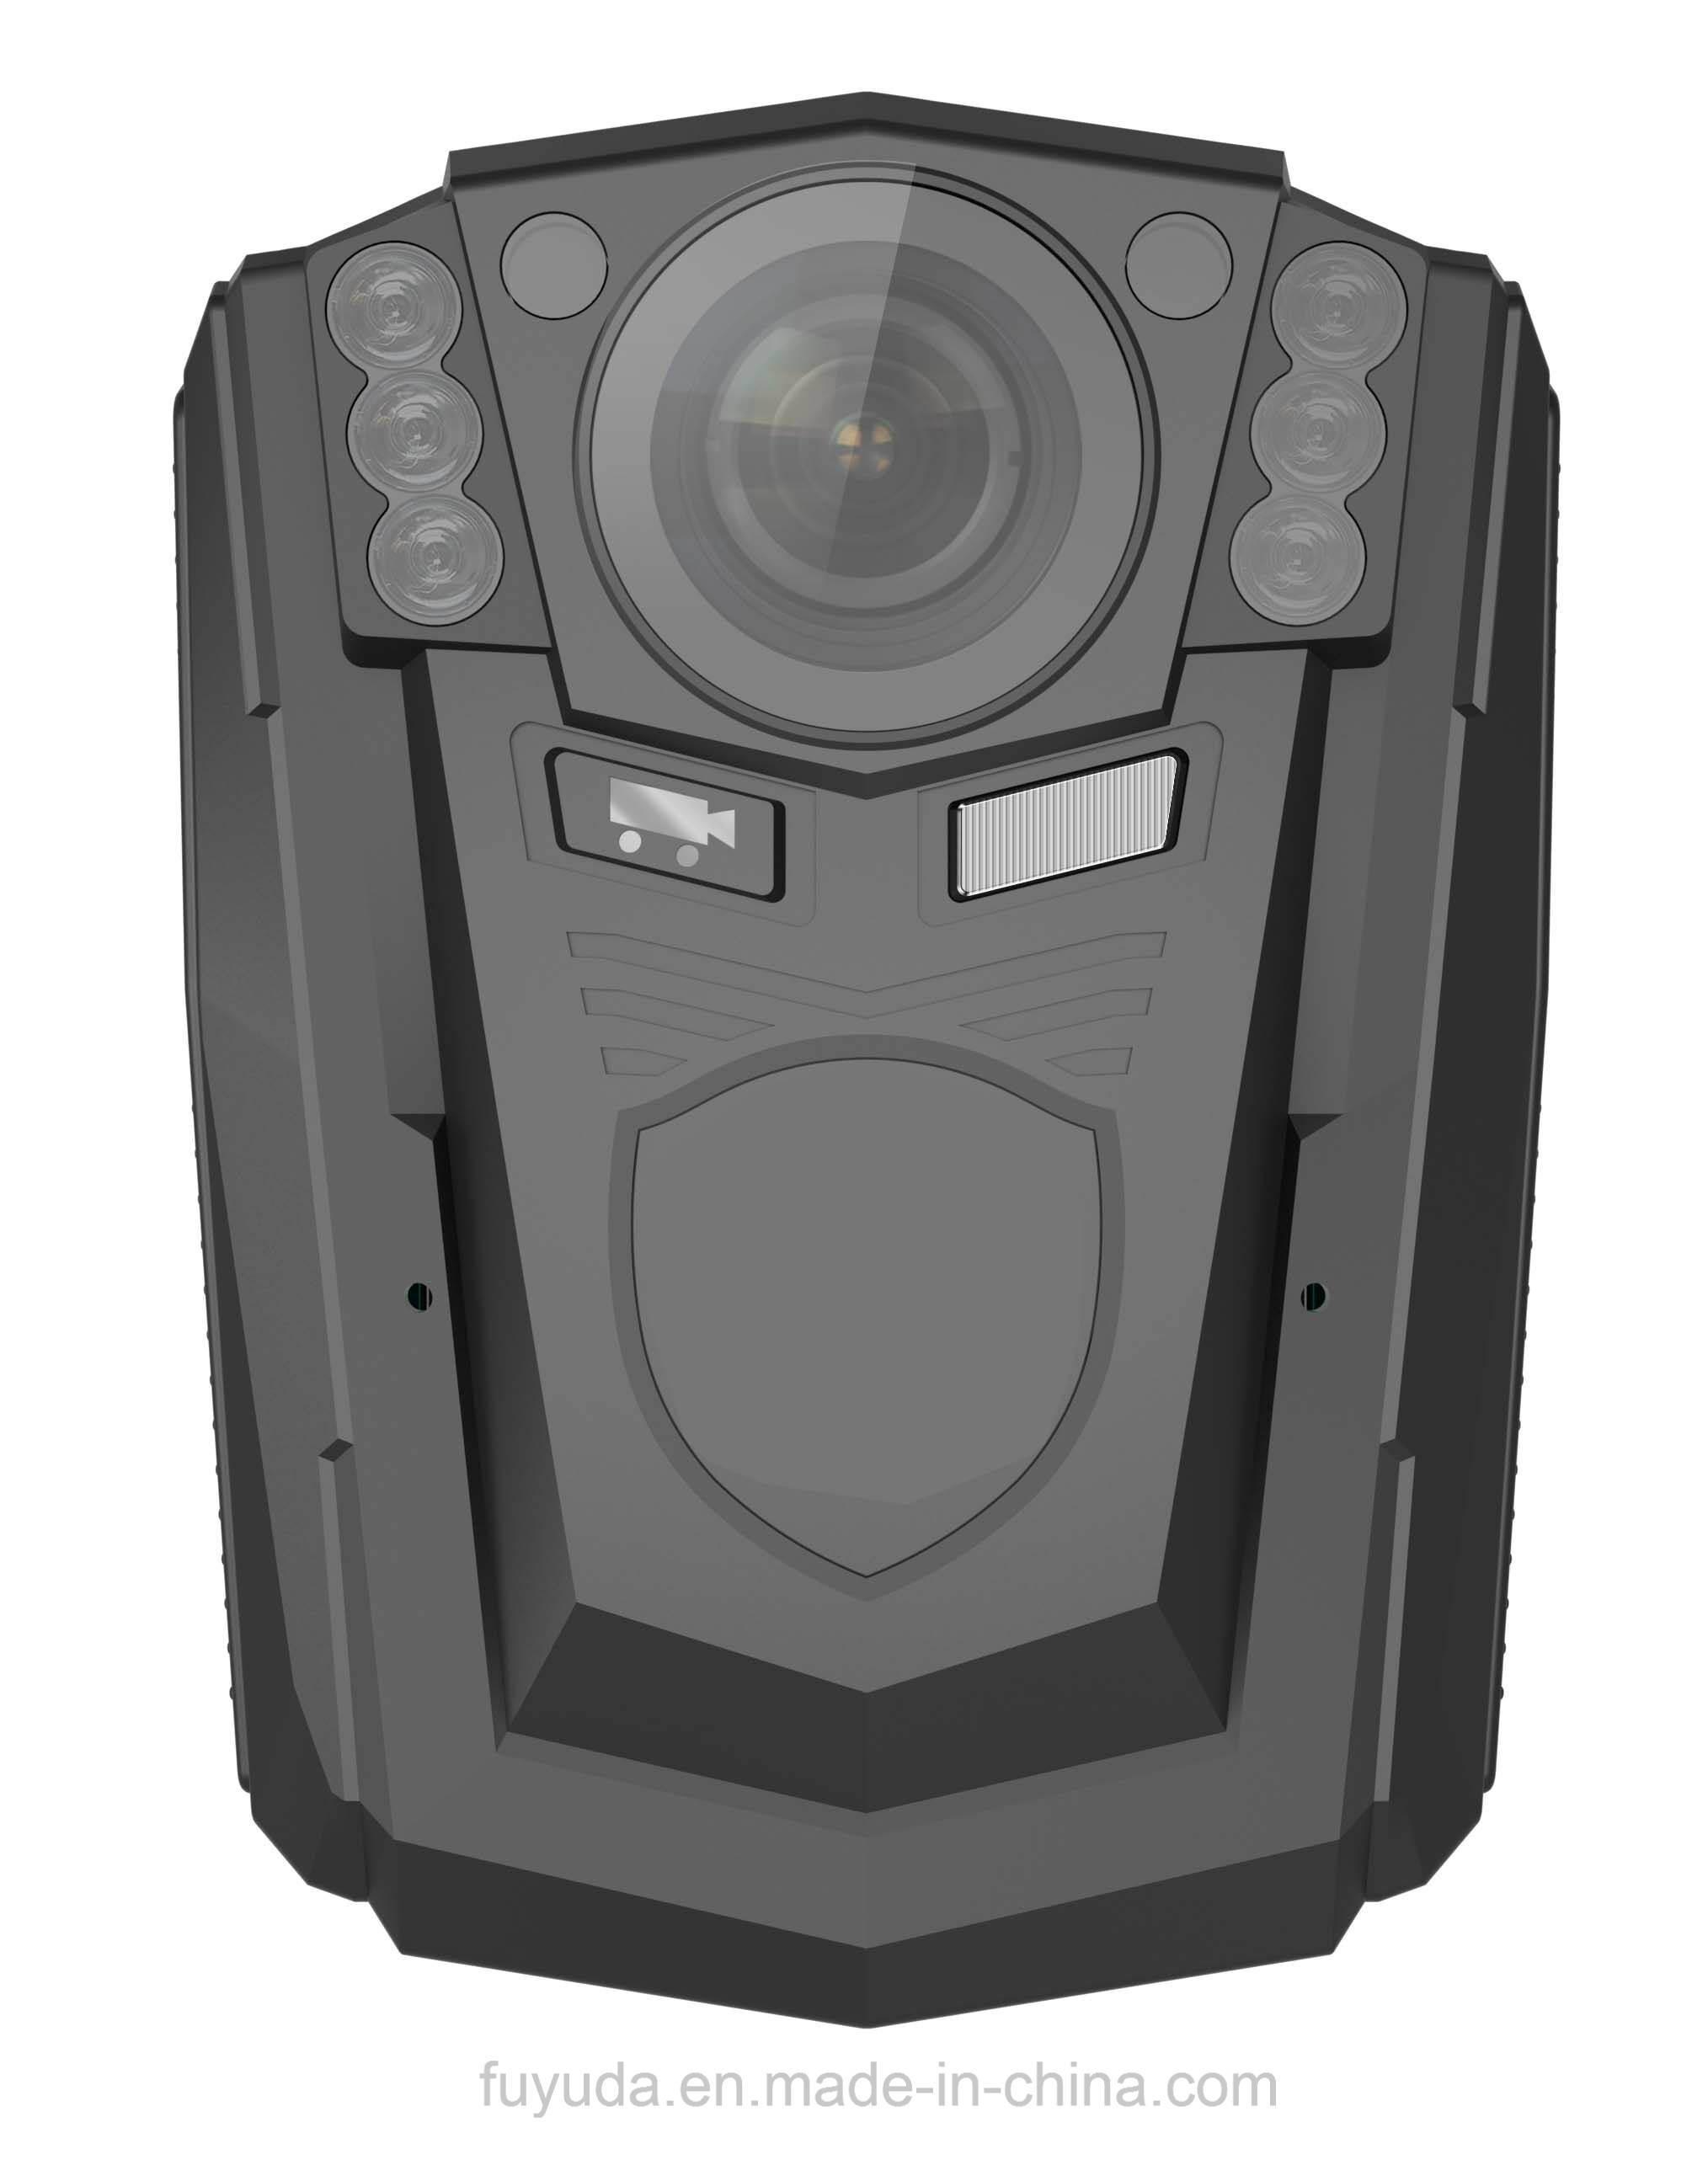 Waterproof HD1080p Mini Police Body Worn Camera with Remote Control